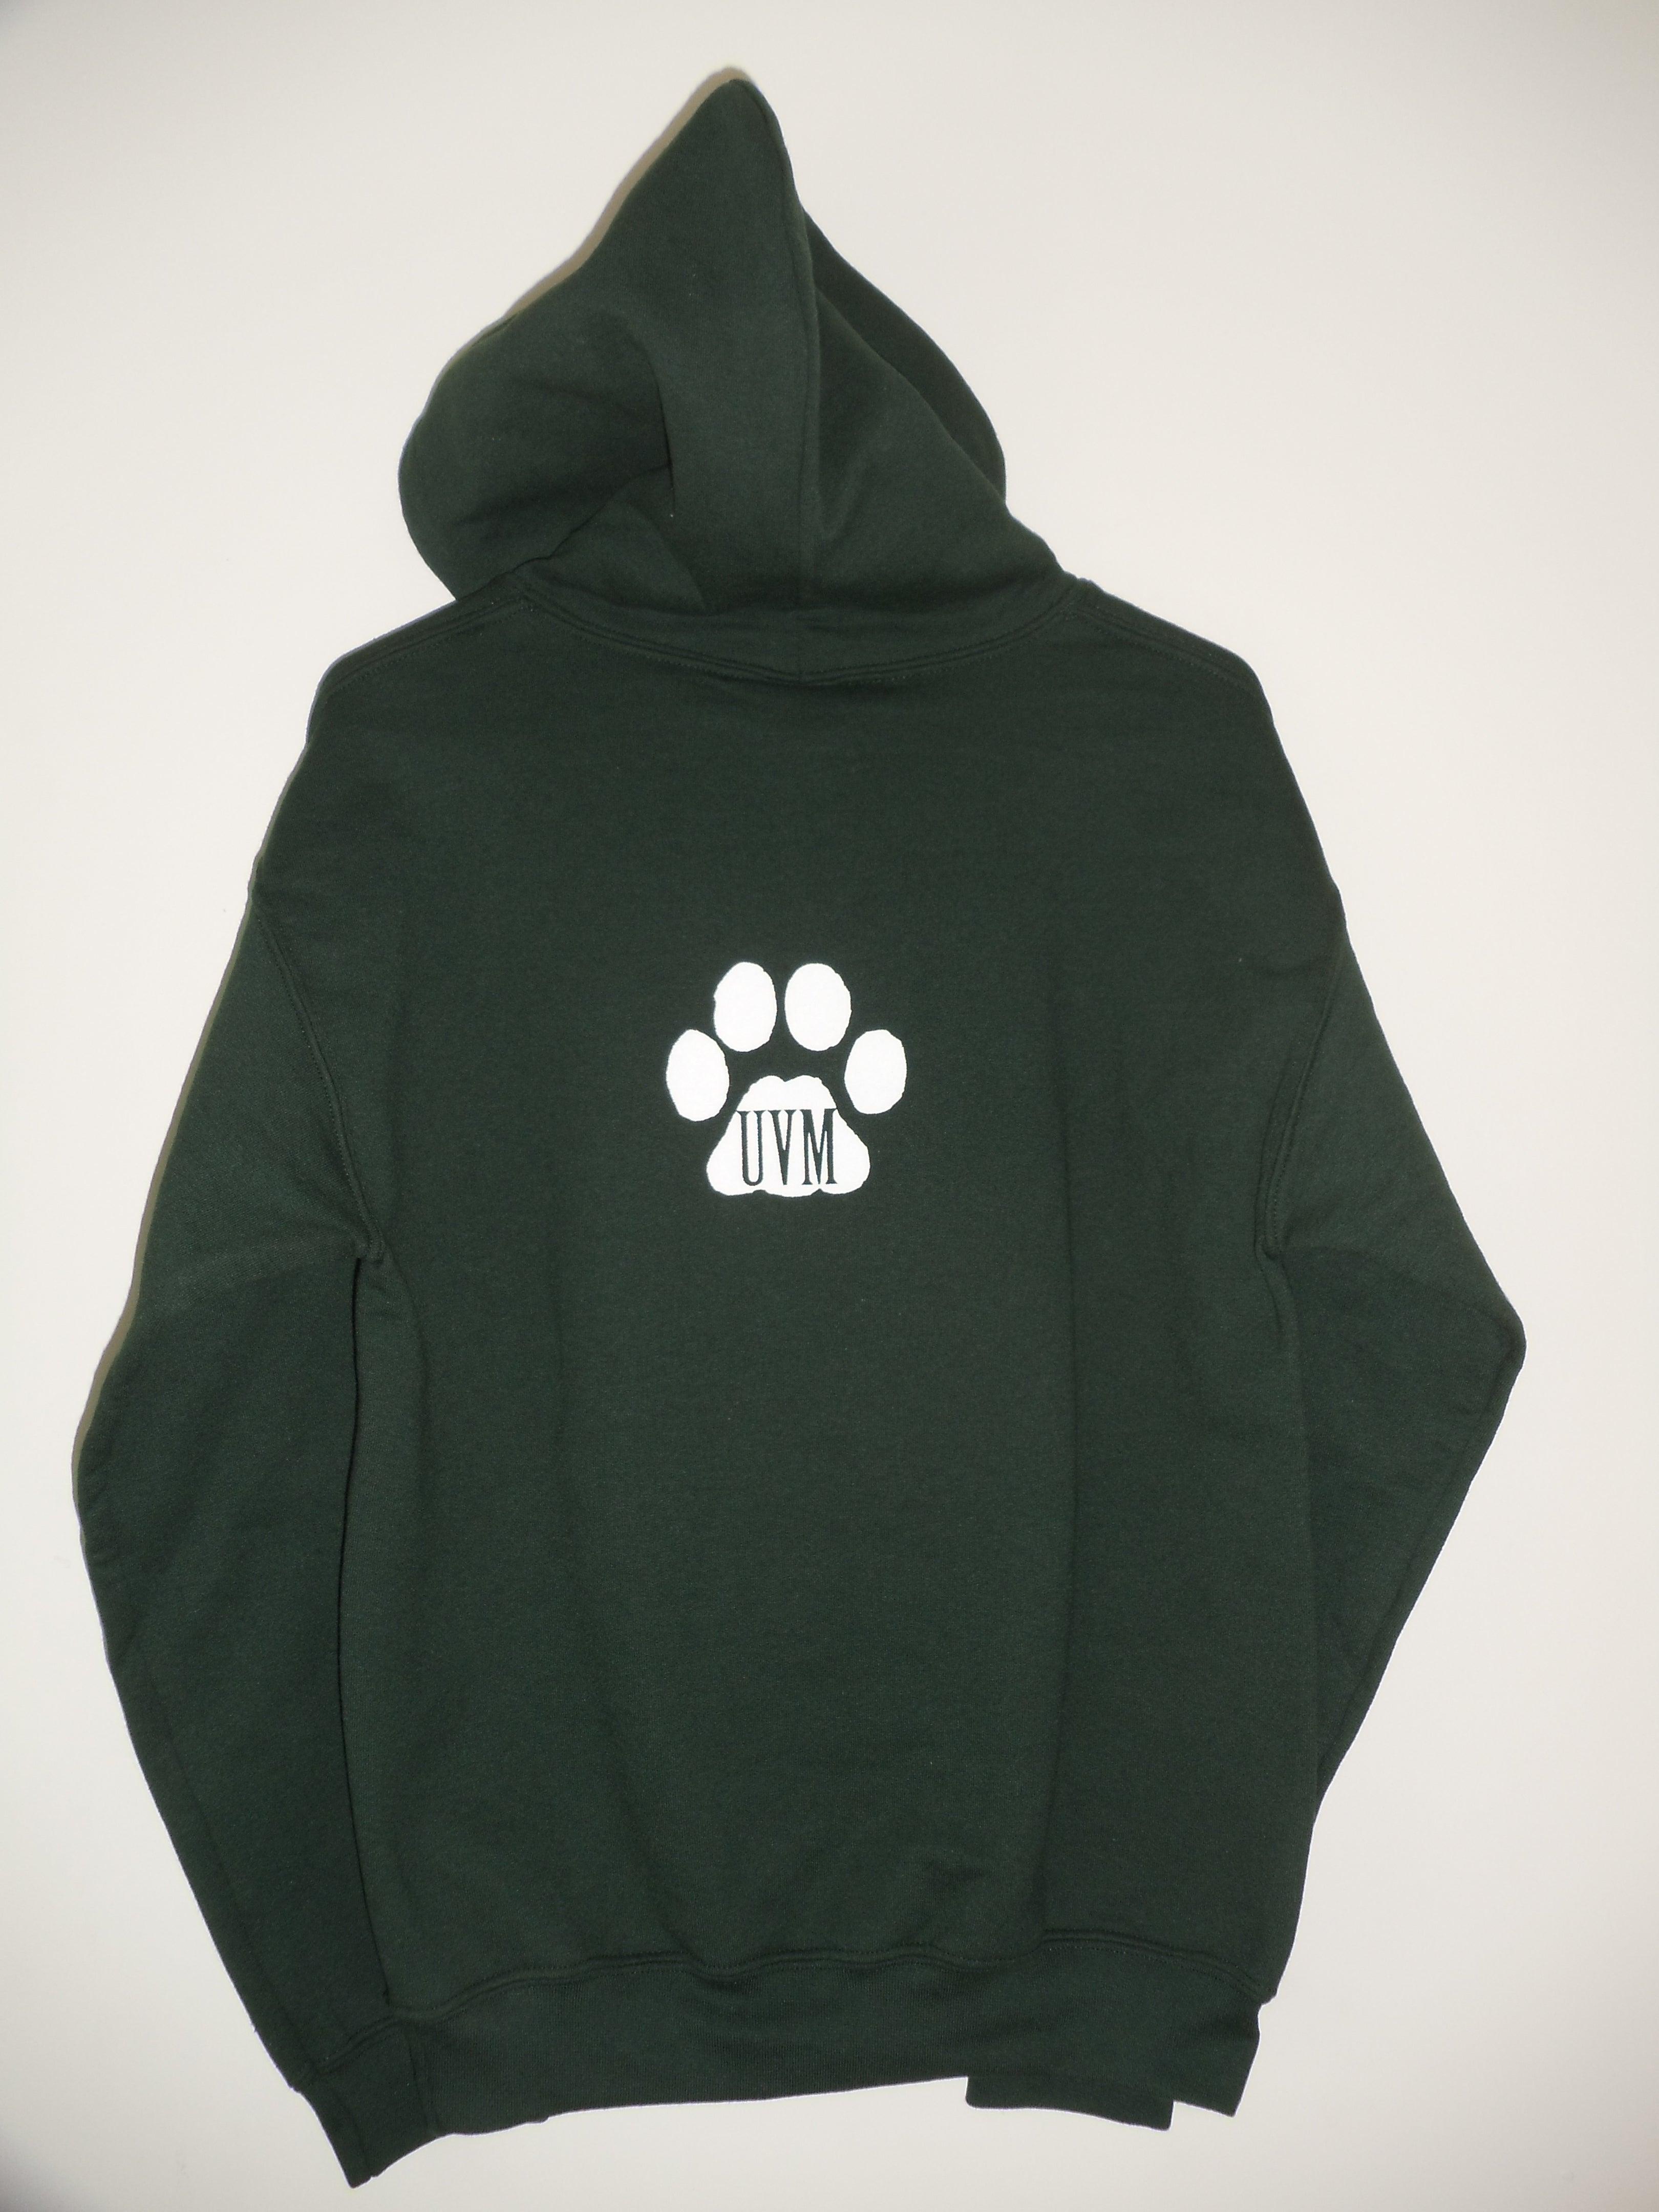 Lovermont 802 — University of Vermont (UVM) Hooded Sweatshirt w ...